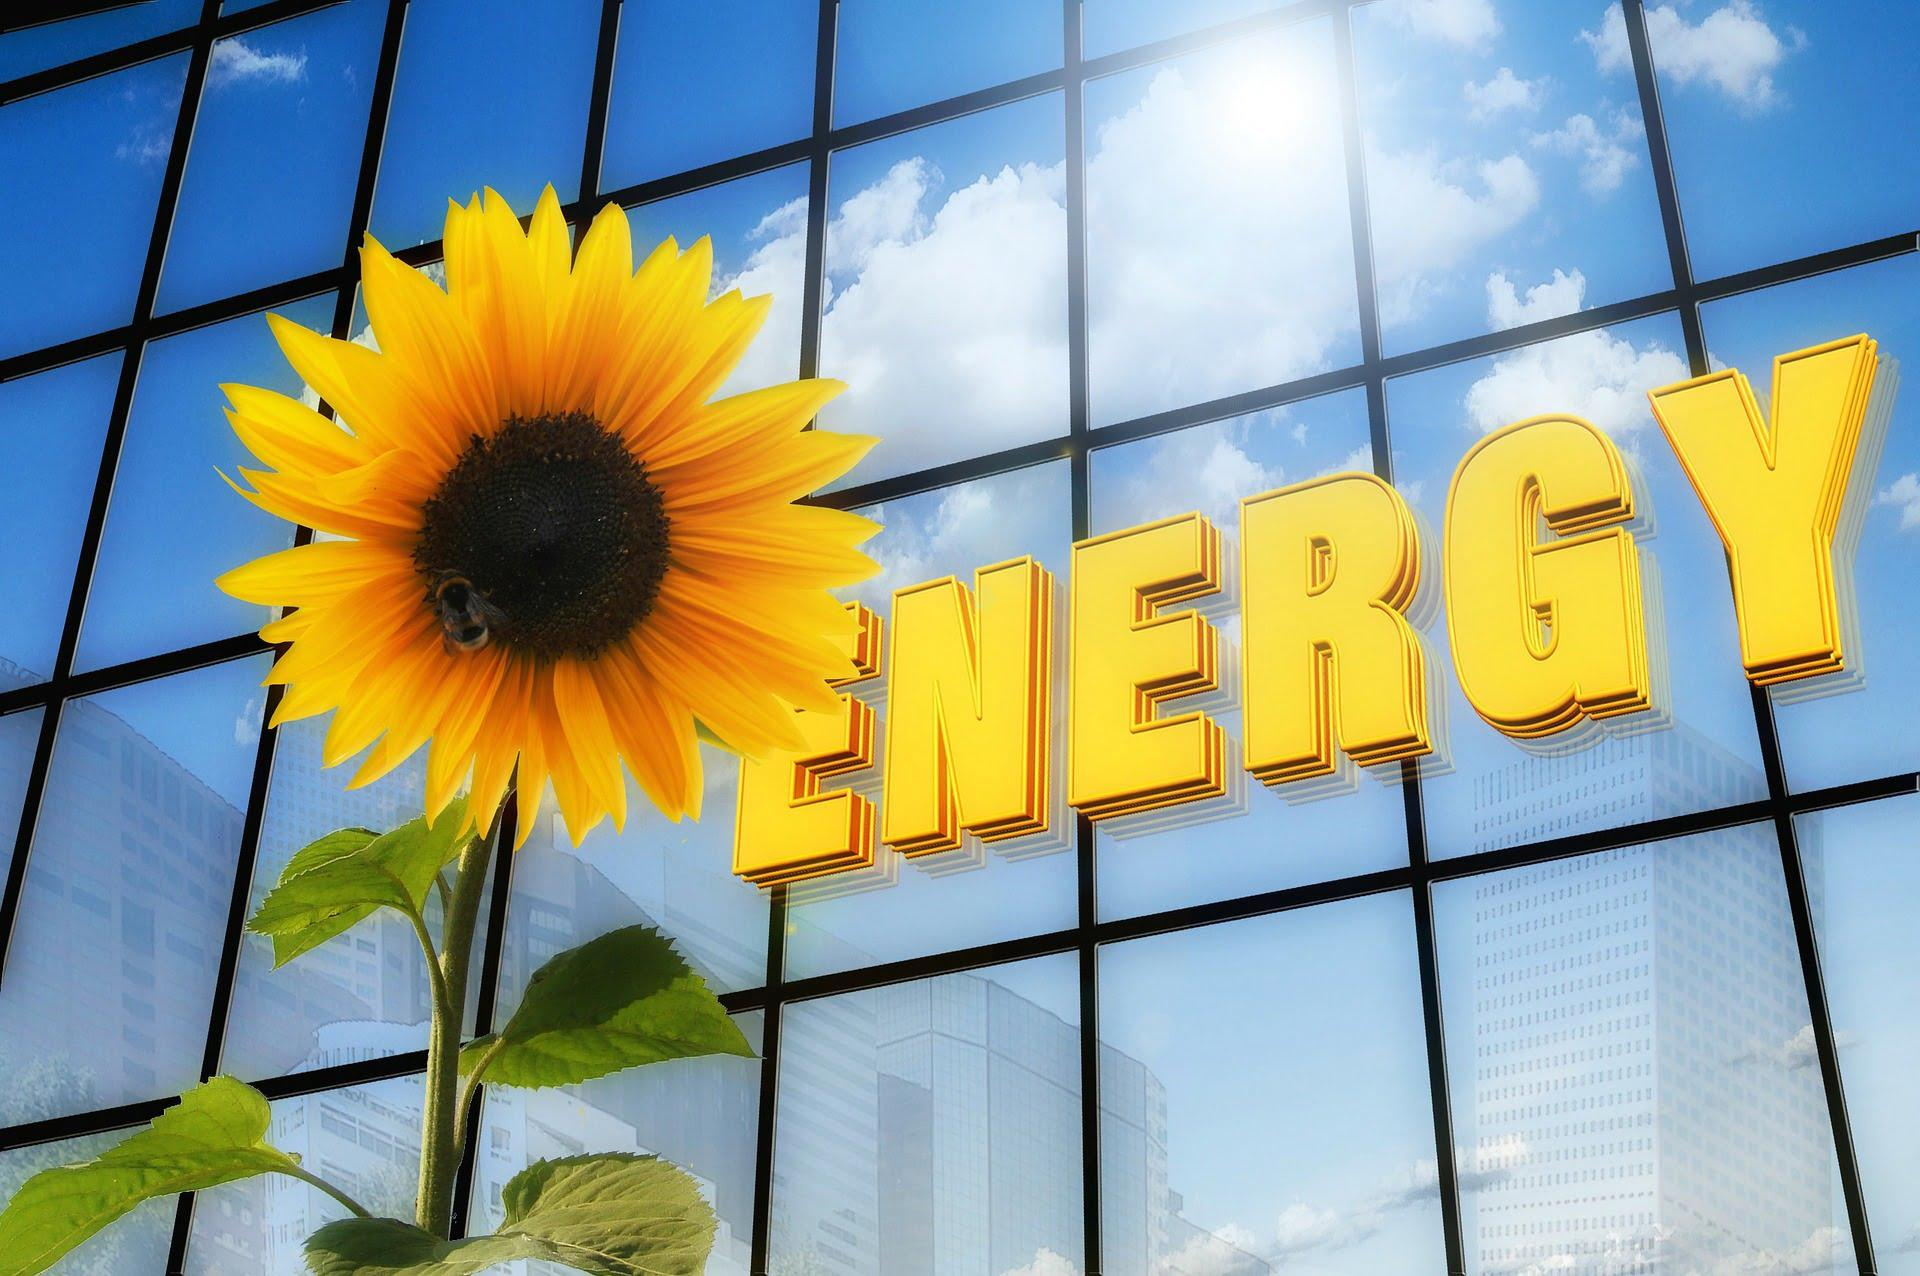 energetika projekt energy-139366_1920